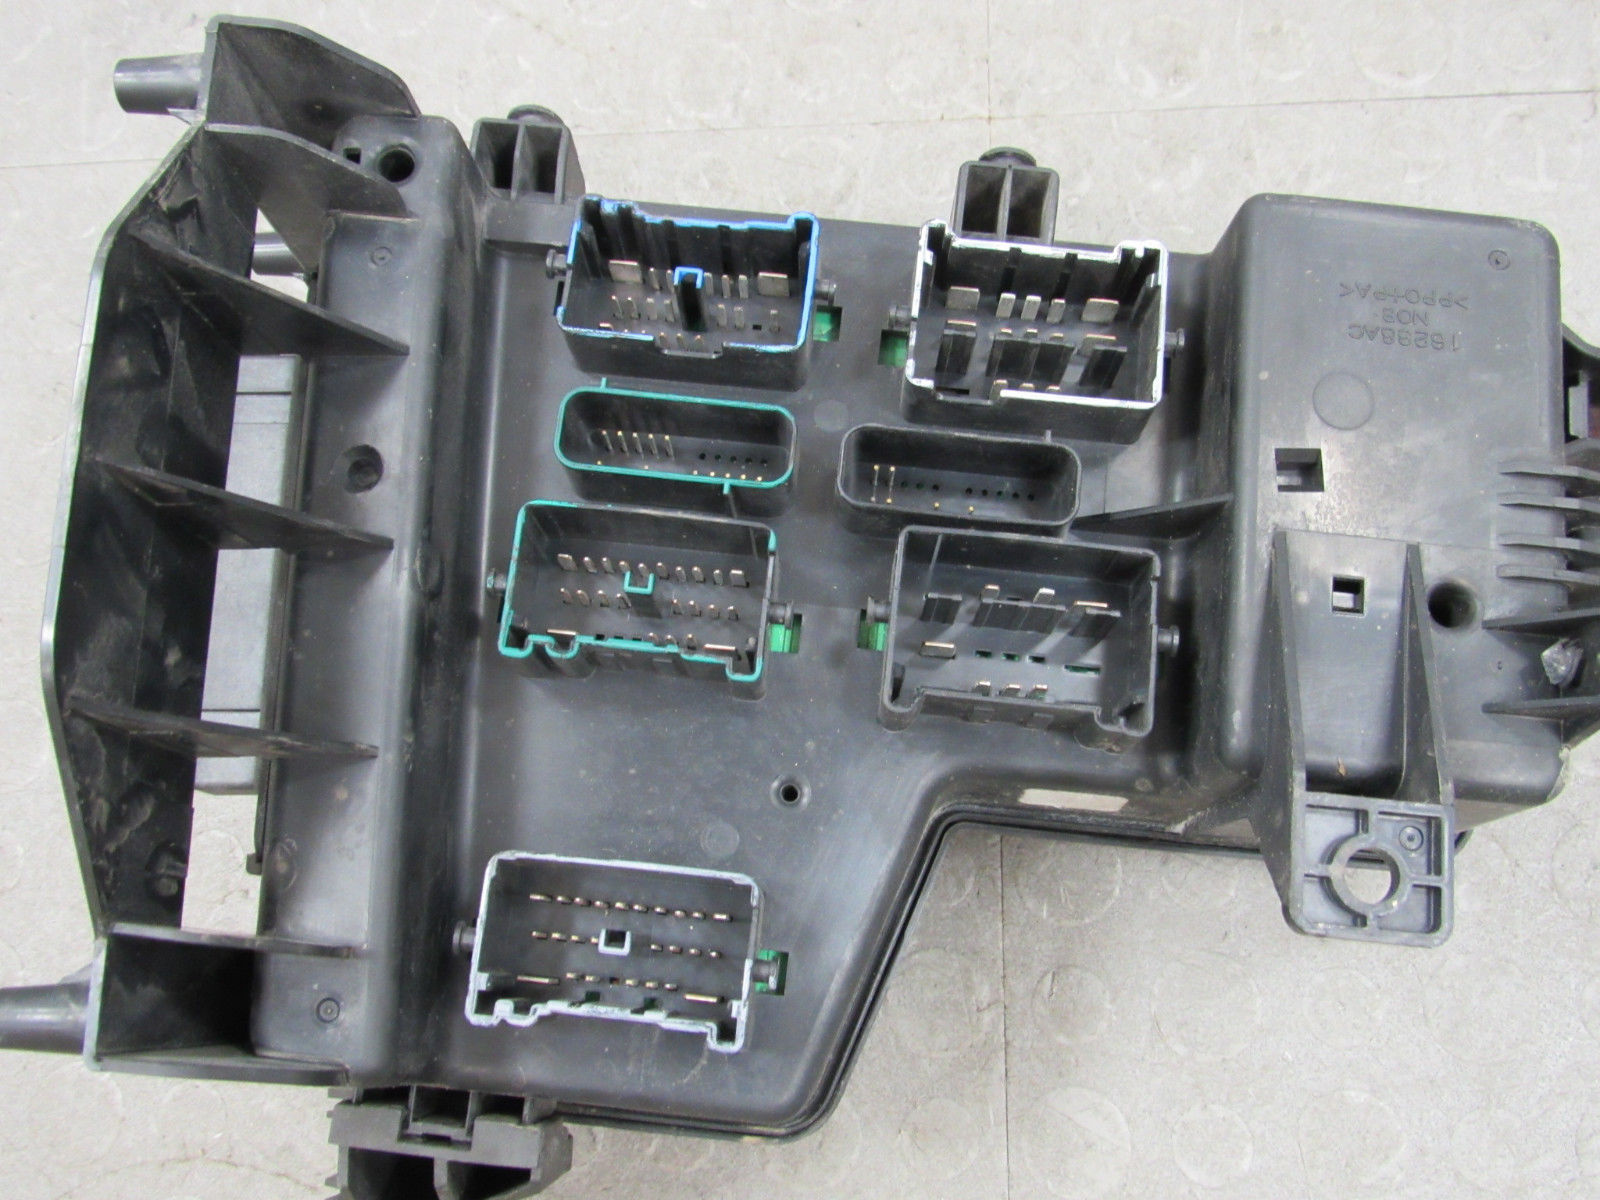 02 03 Dodge Ram Integrated Power Distribution Module Fuse Box Lexus Gs350 56049011ah El